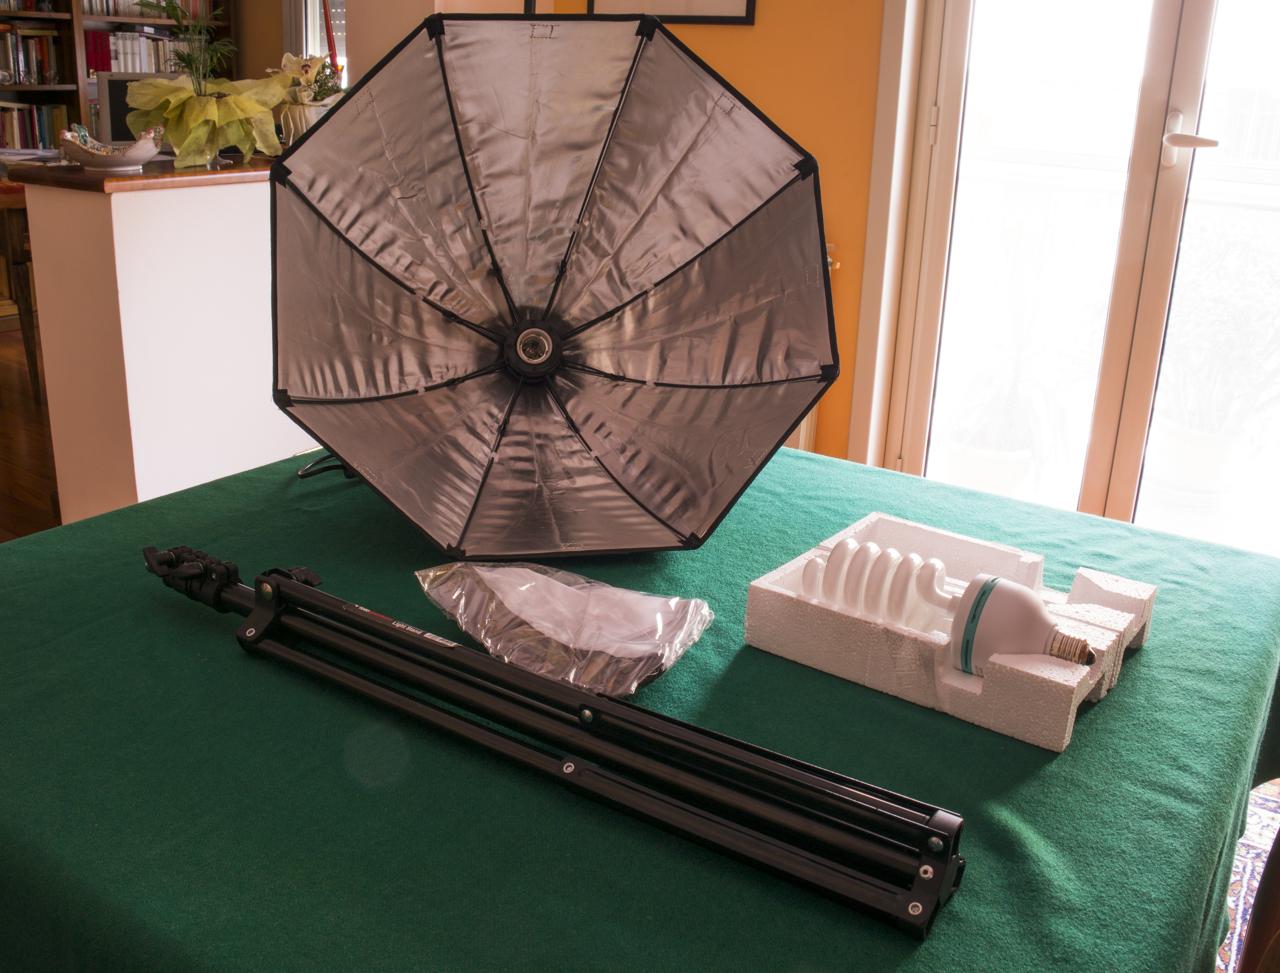 http://prostudio360.it/FotoQuantum-StudioMax-Kit-Daylight-450-Softbox-Ottagonale-55cm?utm_source=Crupi&utm_medium=Review-daylight-450-softbox